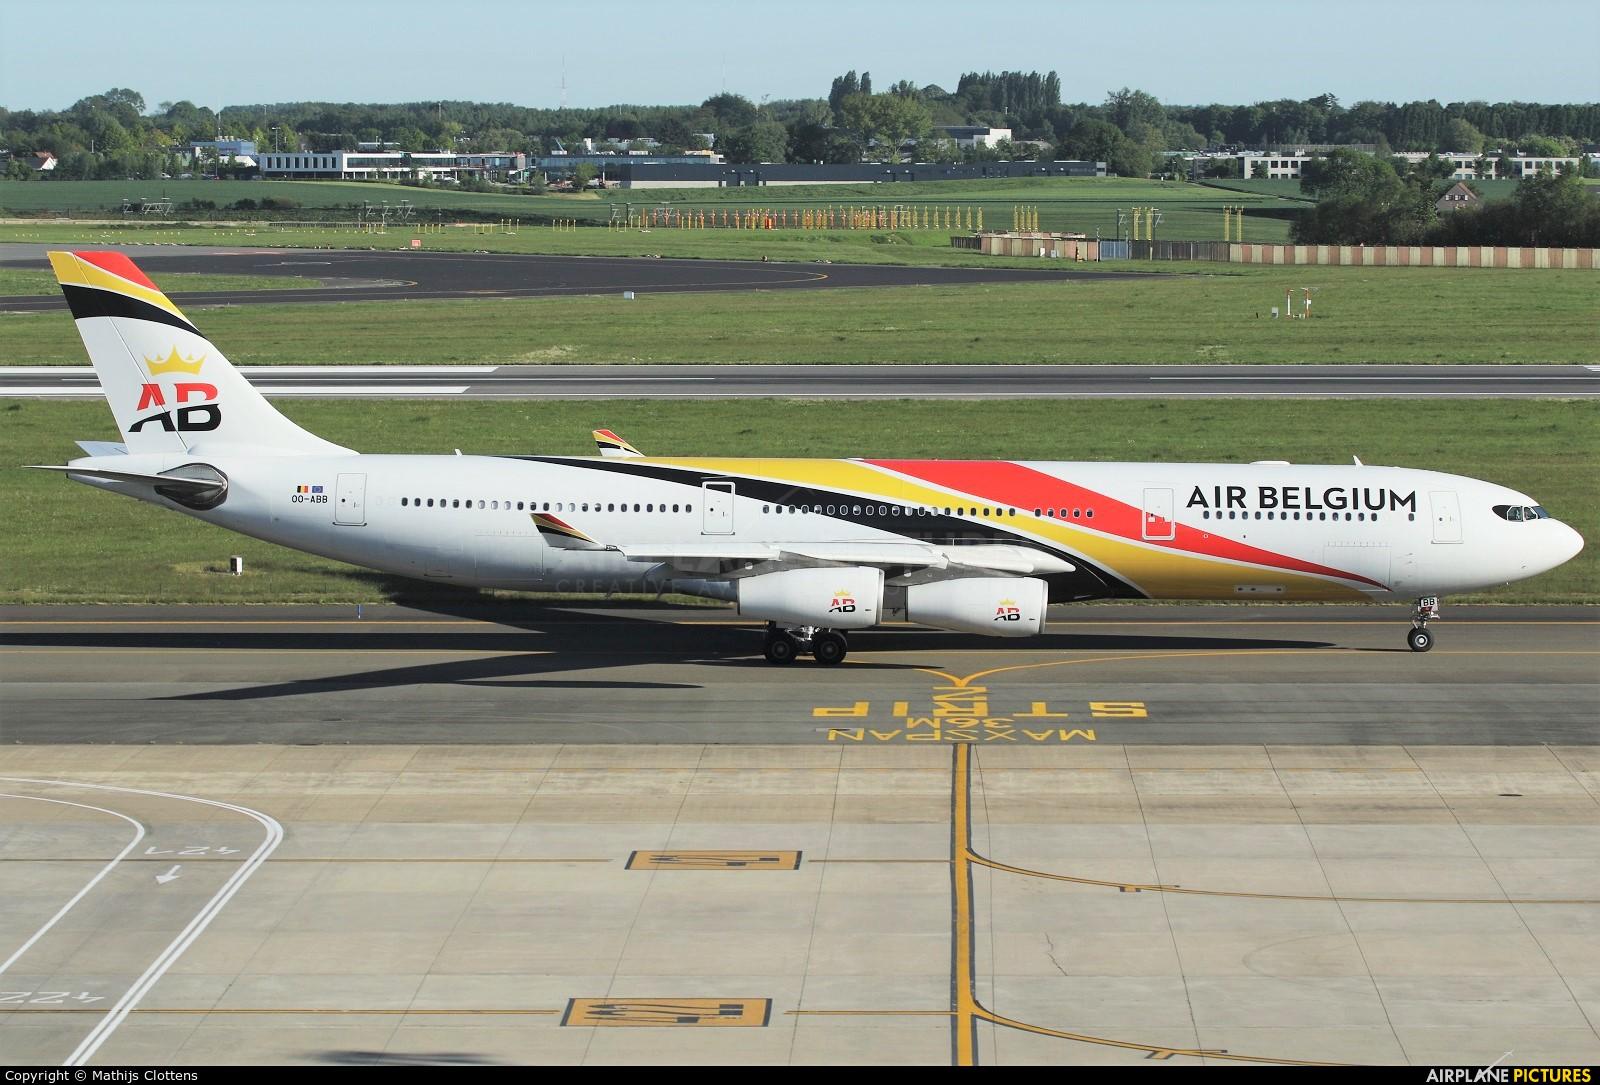 Air Belgium OO-ABB aircraft at Brussels - Zaventem